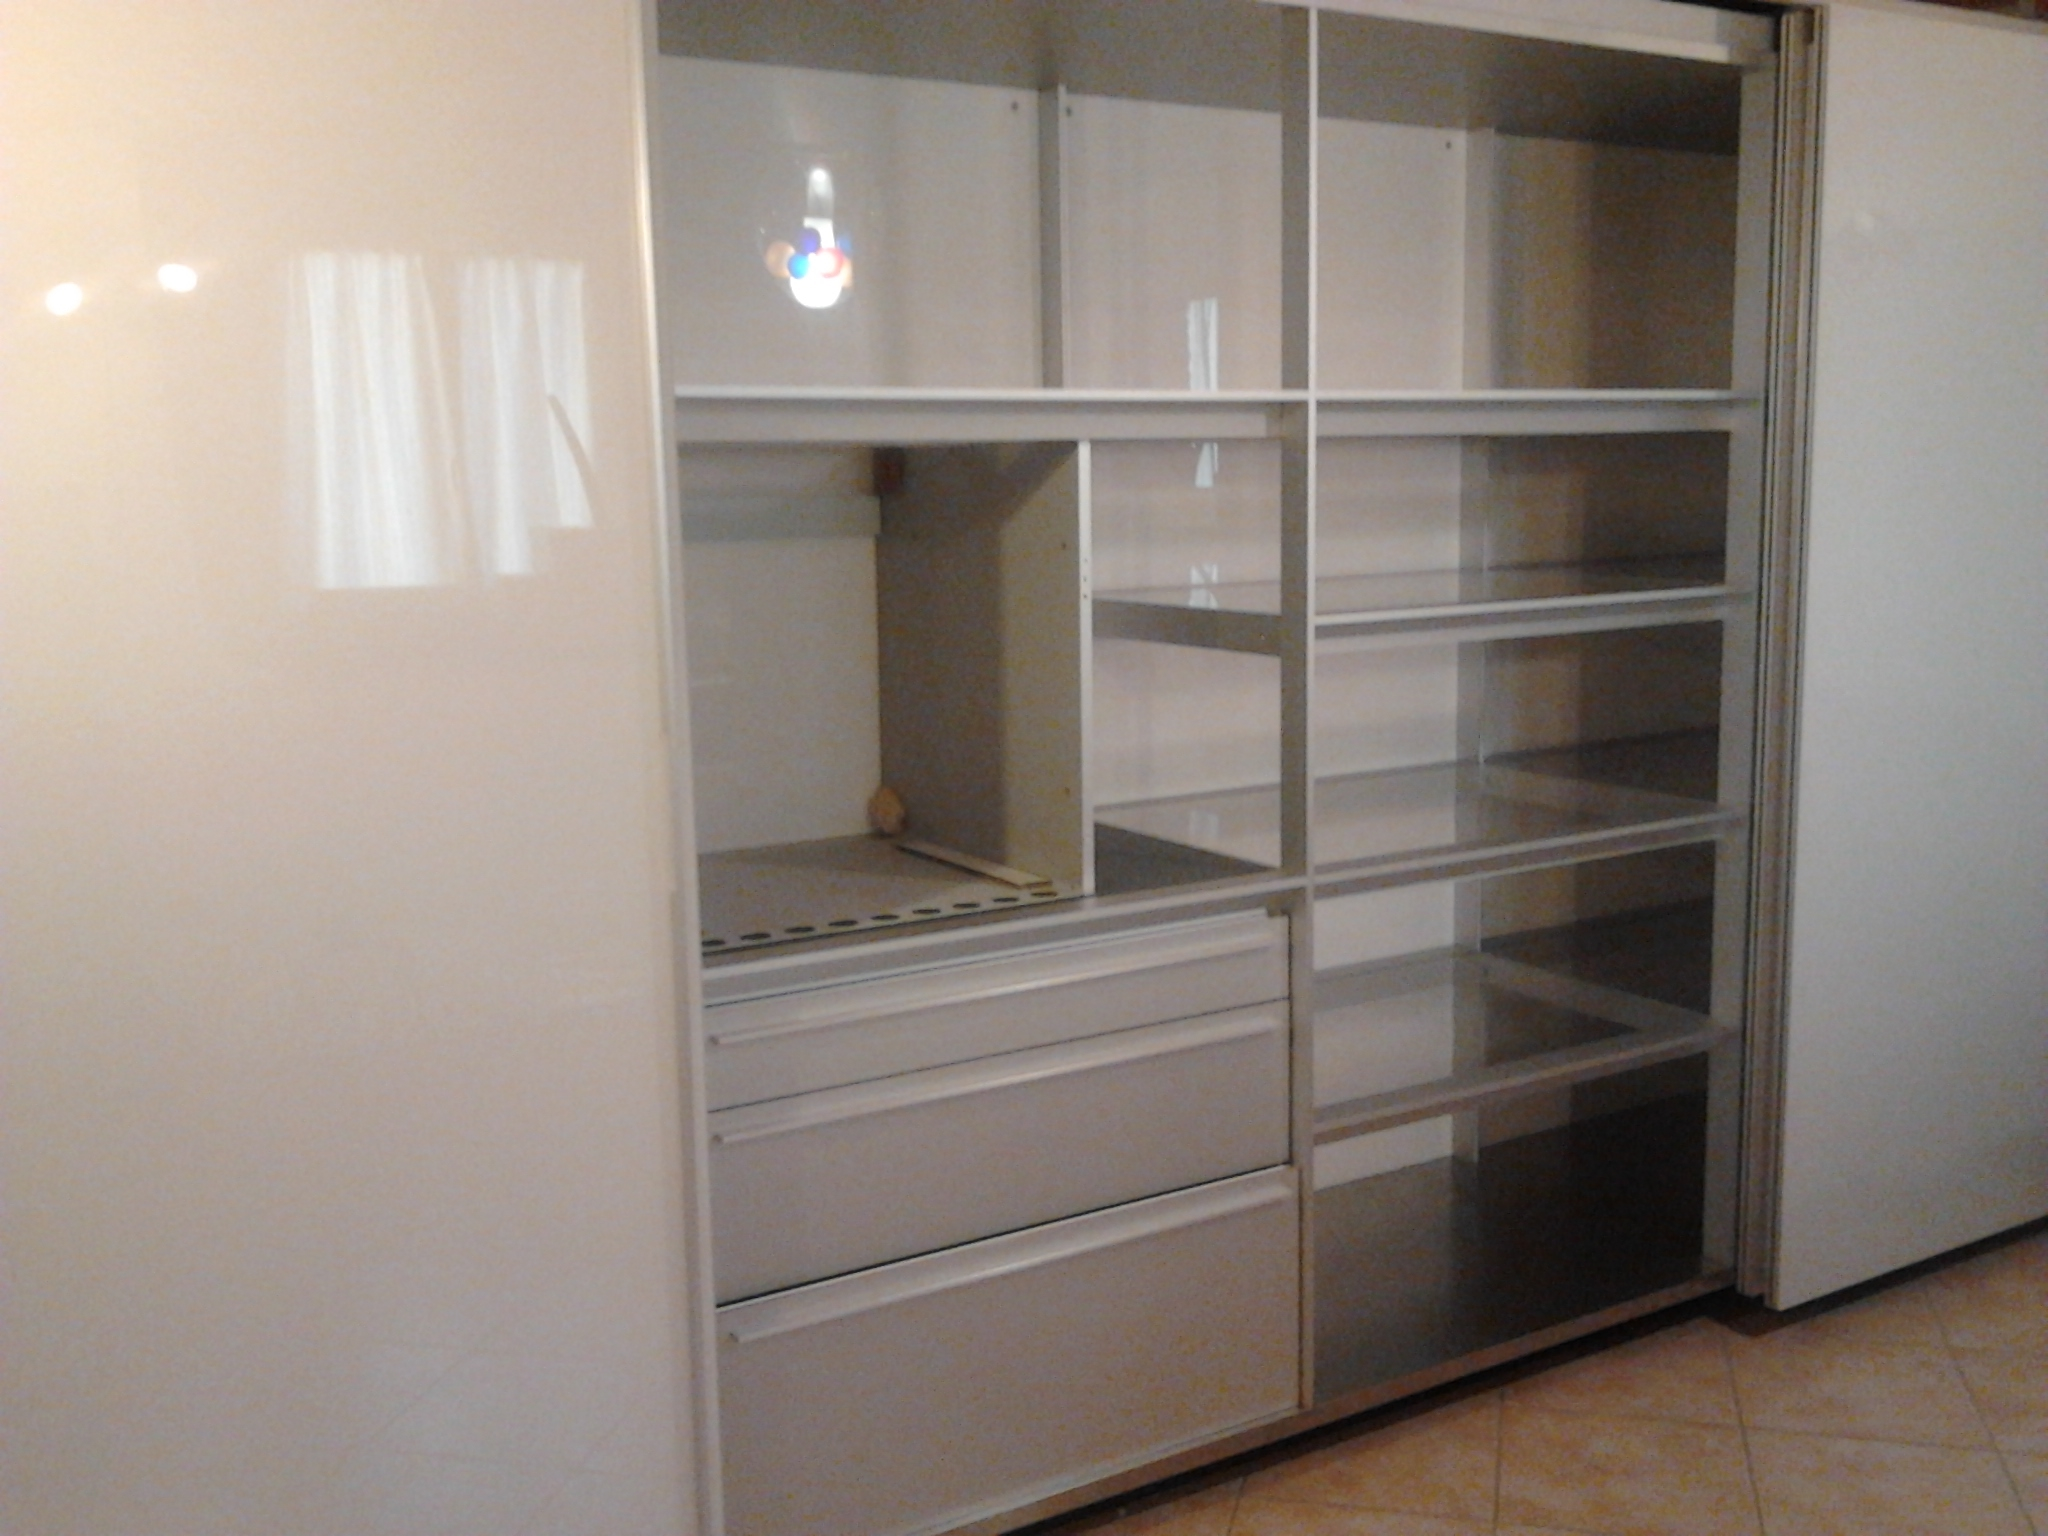 ARMADIO VALCUCINE IN OFFERTA Cucine A Prezzi Scontati #81644A 2048 1536 Veneta Cucine O Valcucine